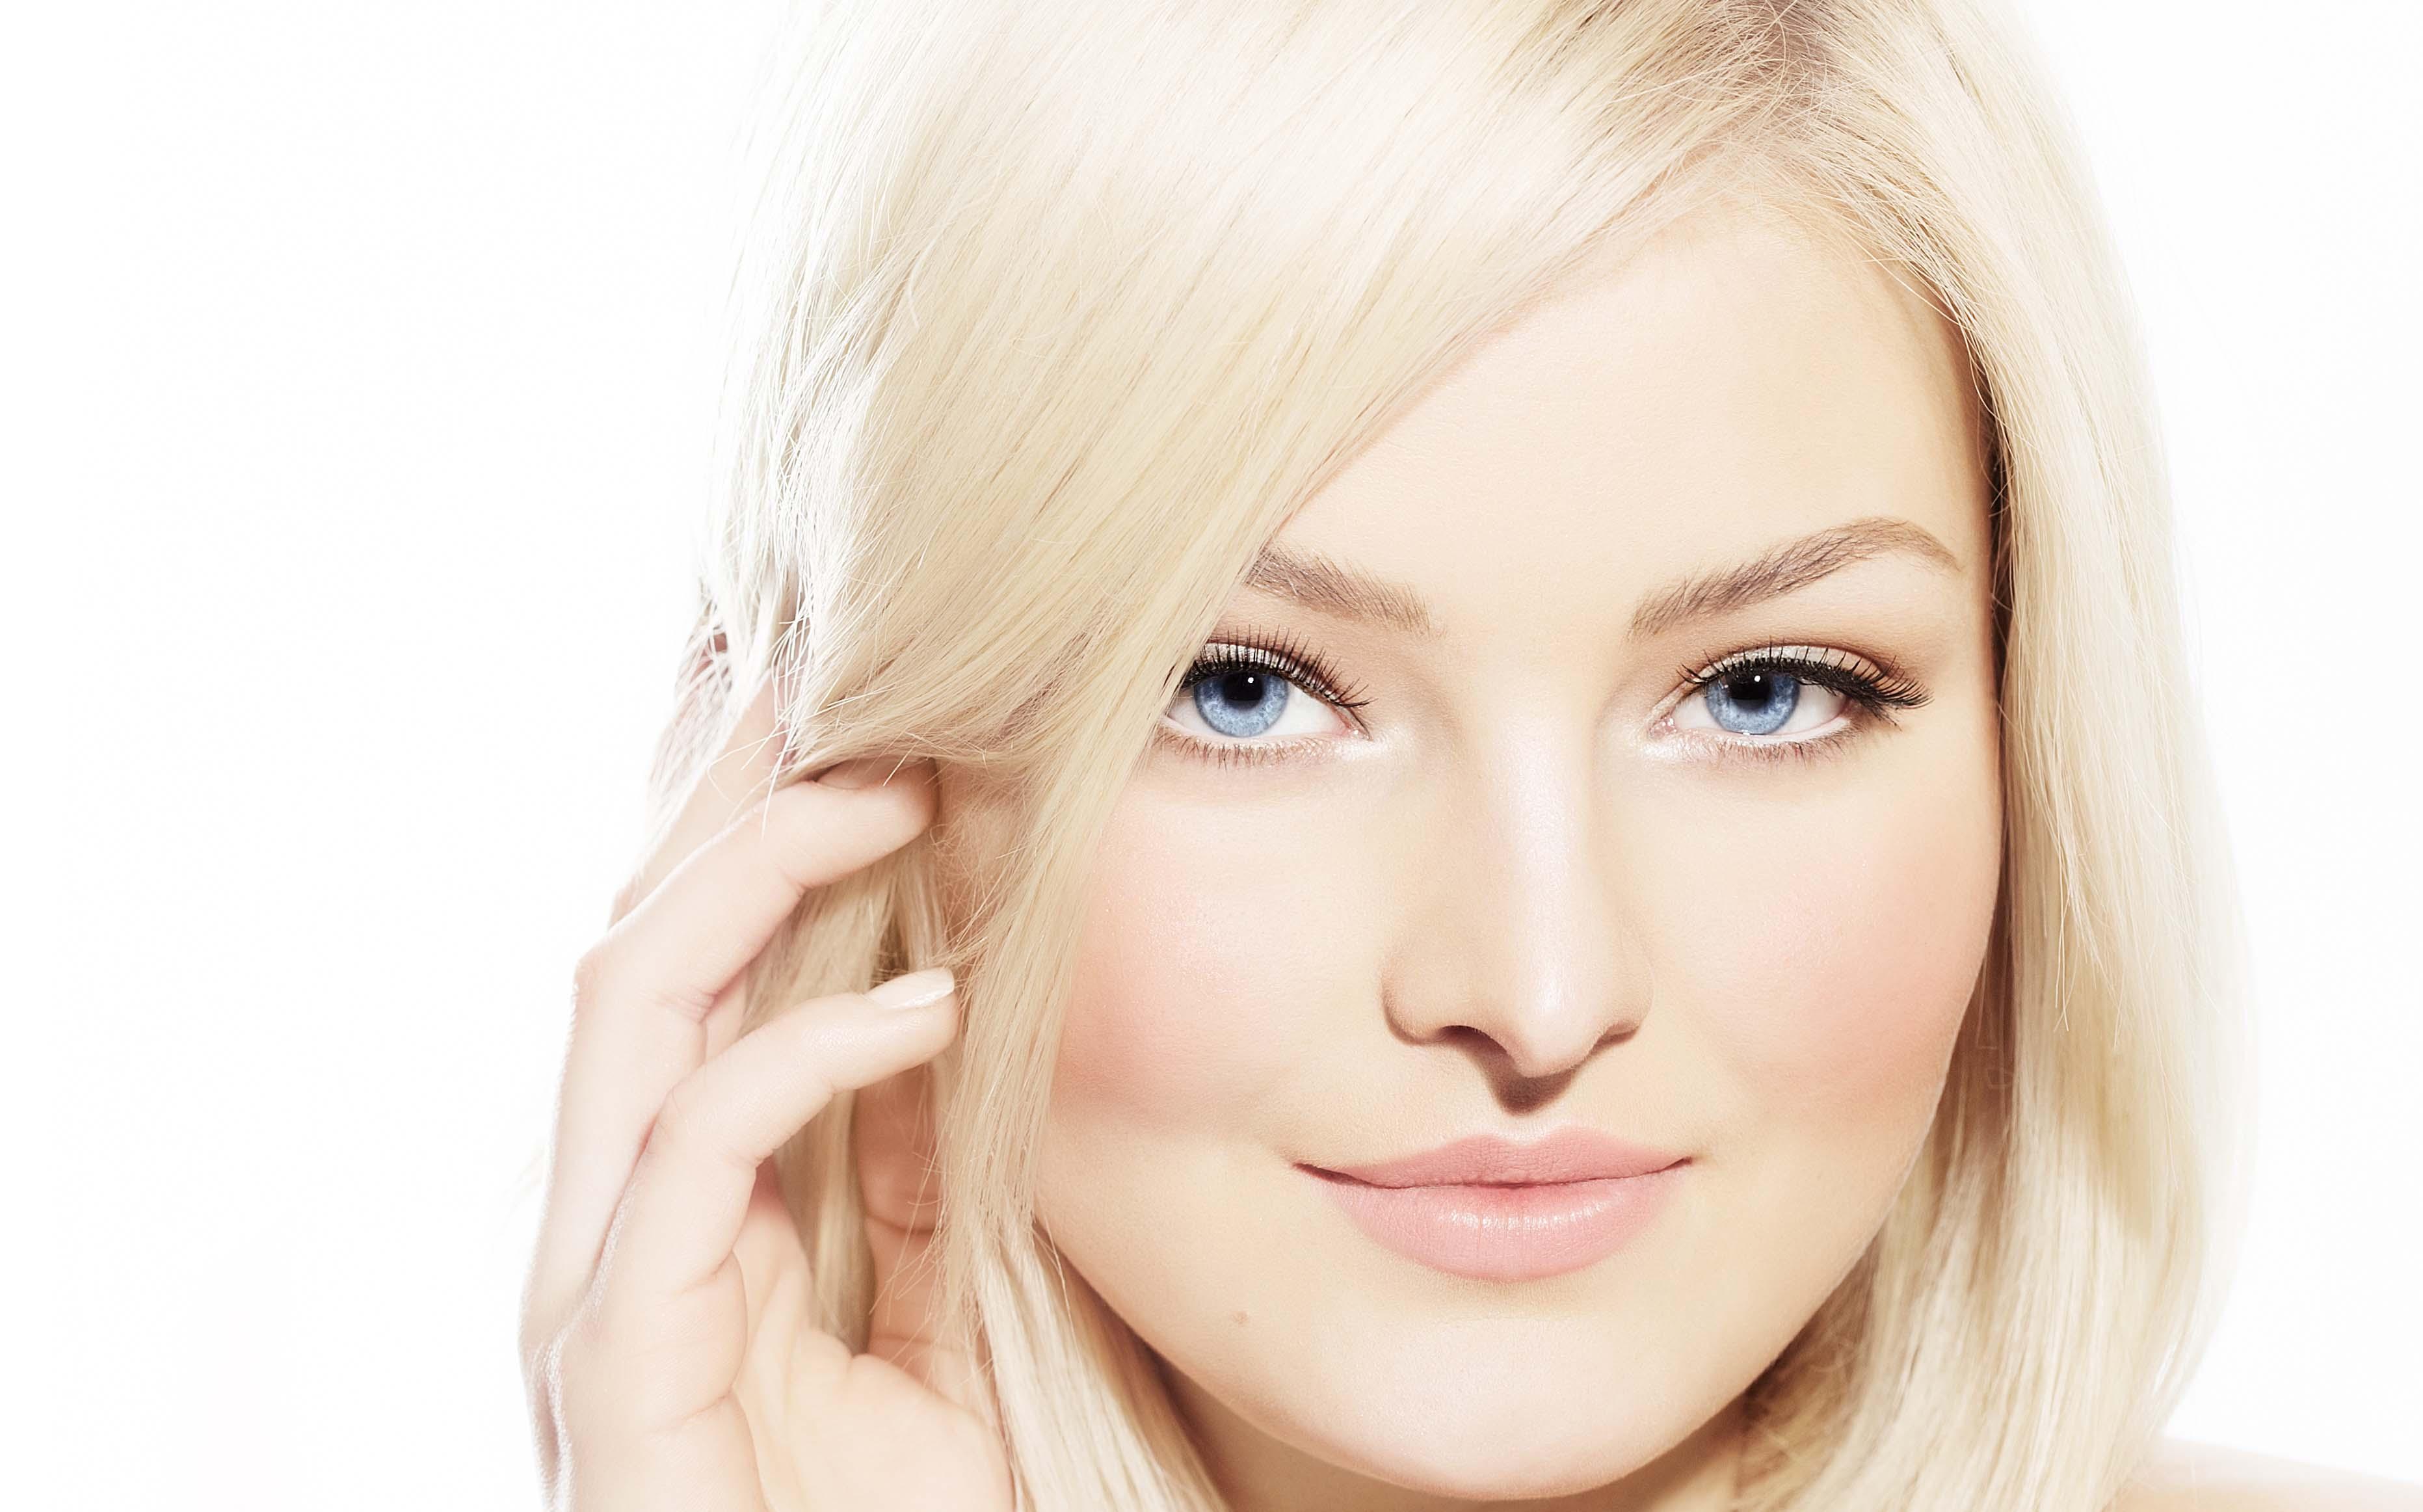 colore-pelle-chiara-zephir-parrucchieri-ascona